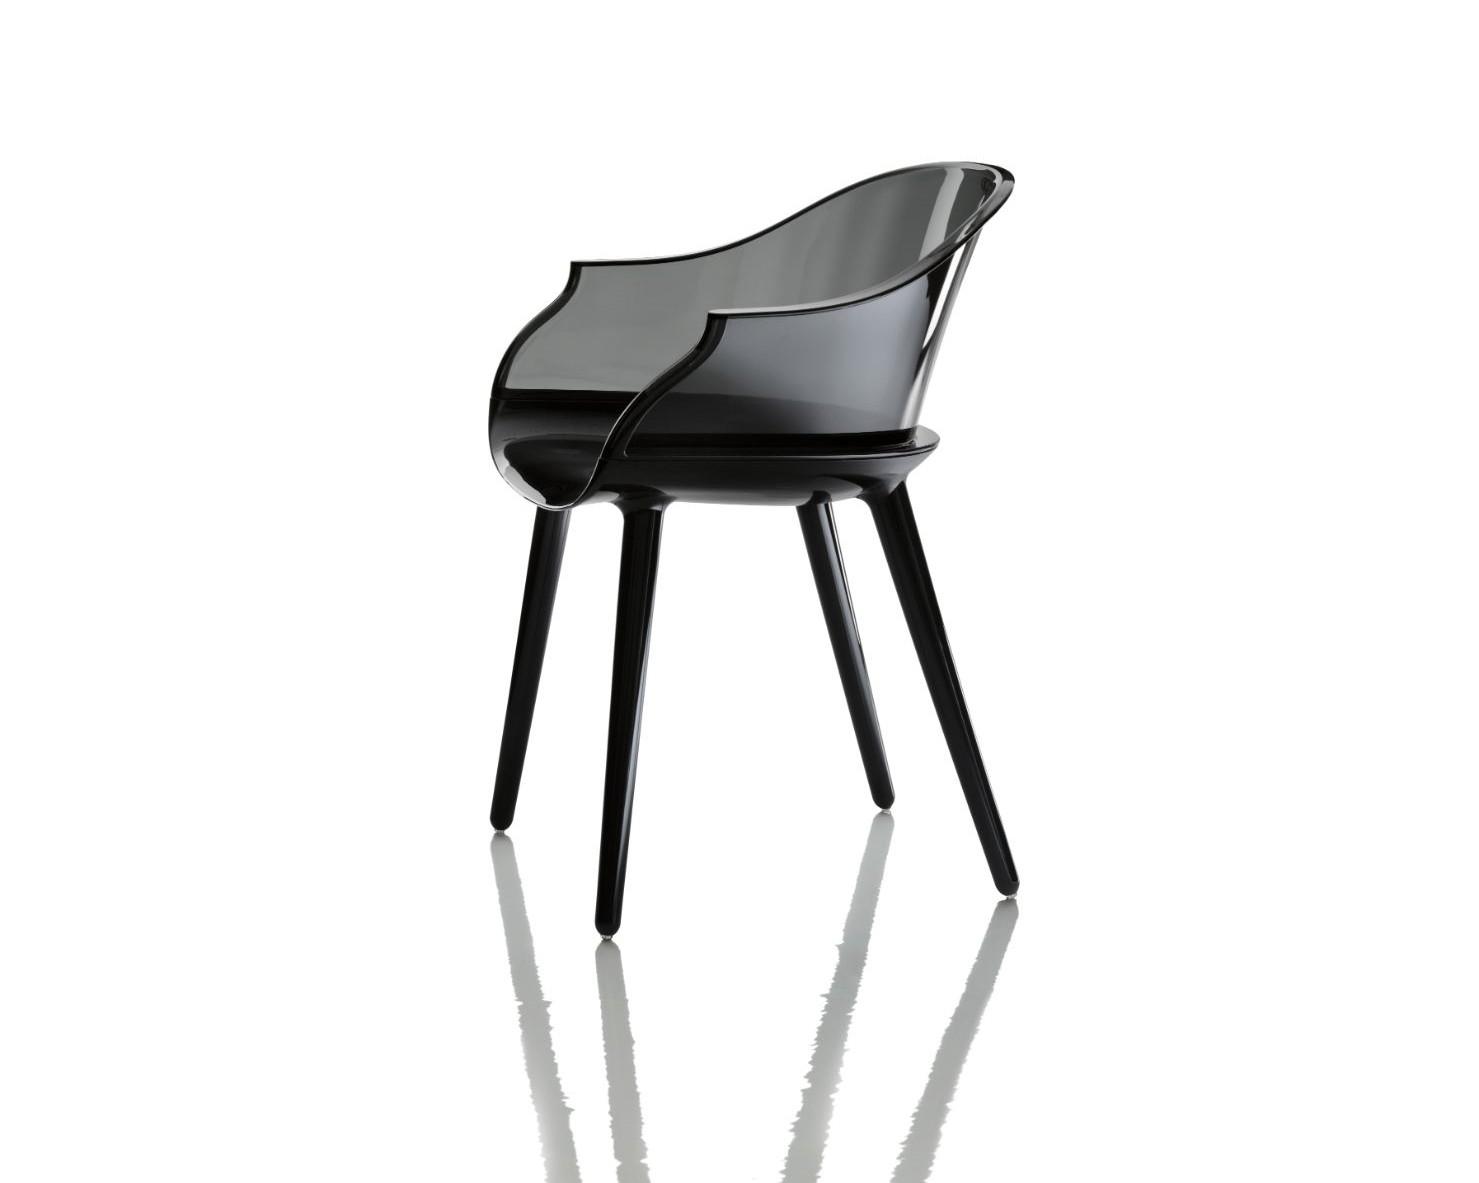 Cyborg Dining Chair